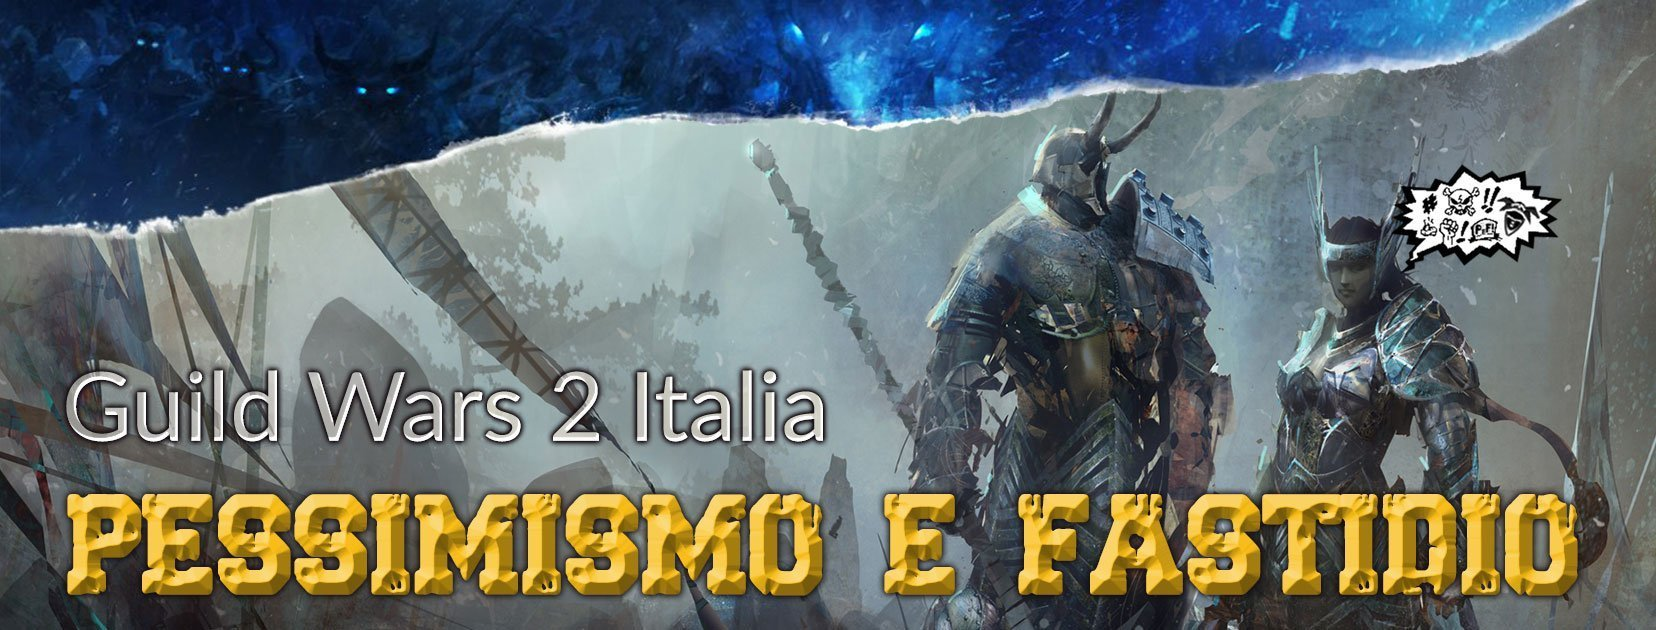 mmo.it partnership Guild Wars 2 Italia Pessimismo e Fastidio partnership mmoit guild wars 2 ita